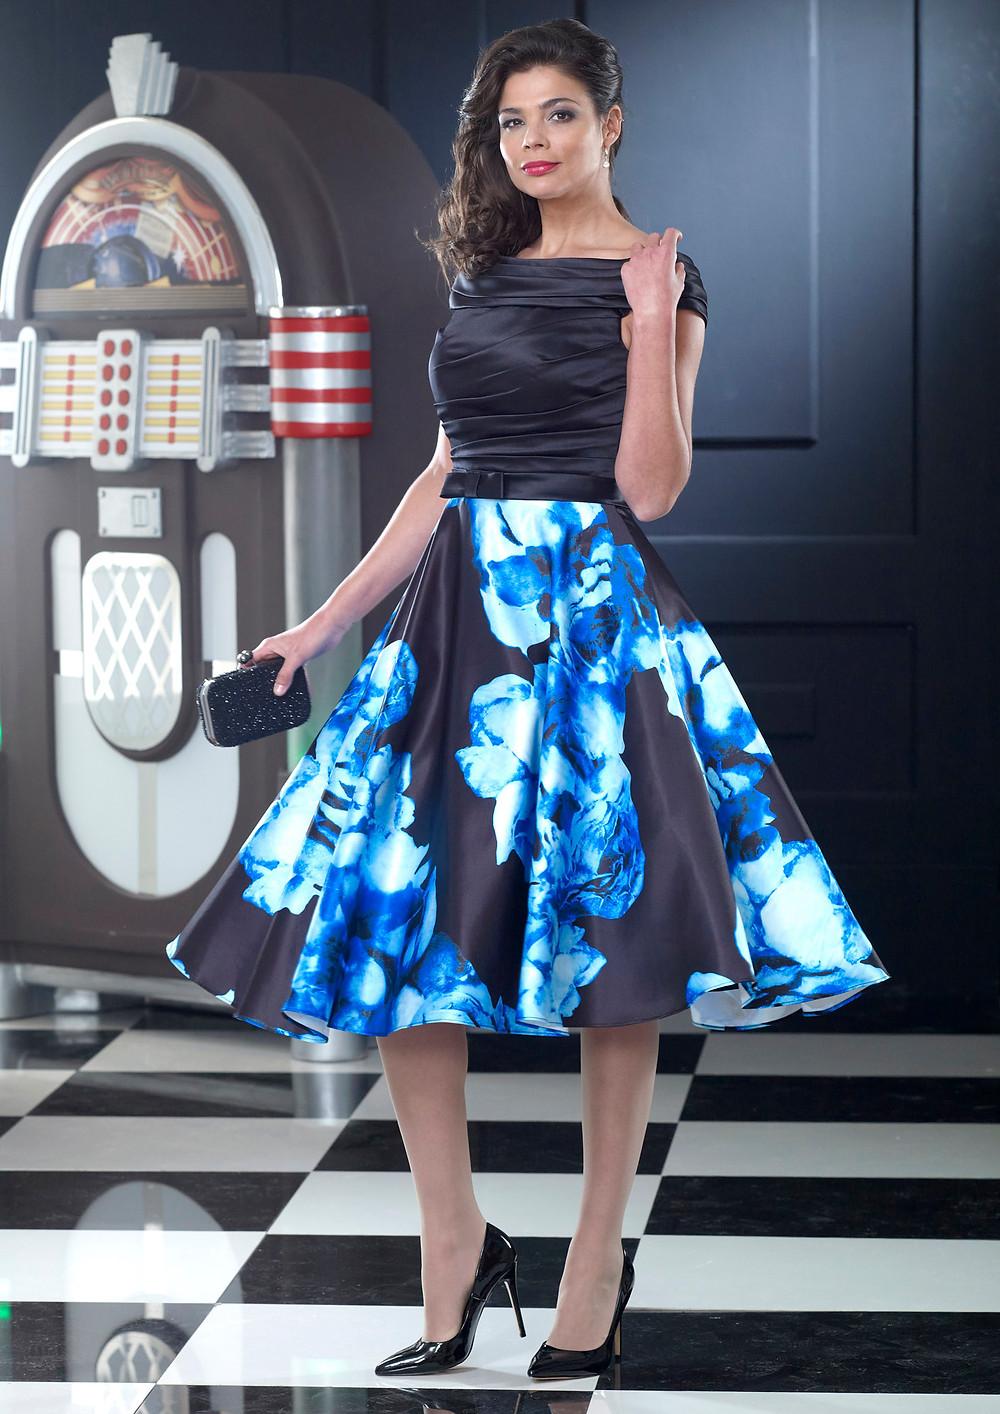 Veromia_VO2210_L_Occasionwear_Ayr_Scotland_Dress